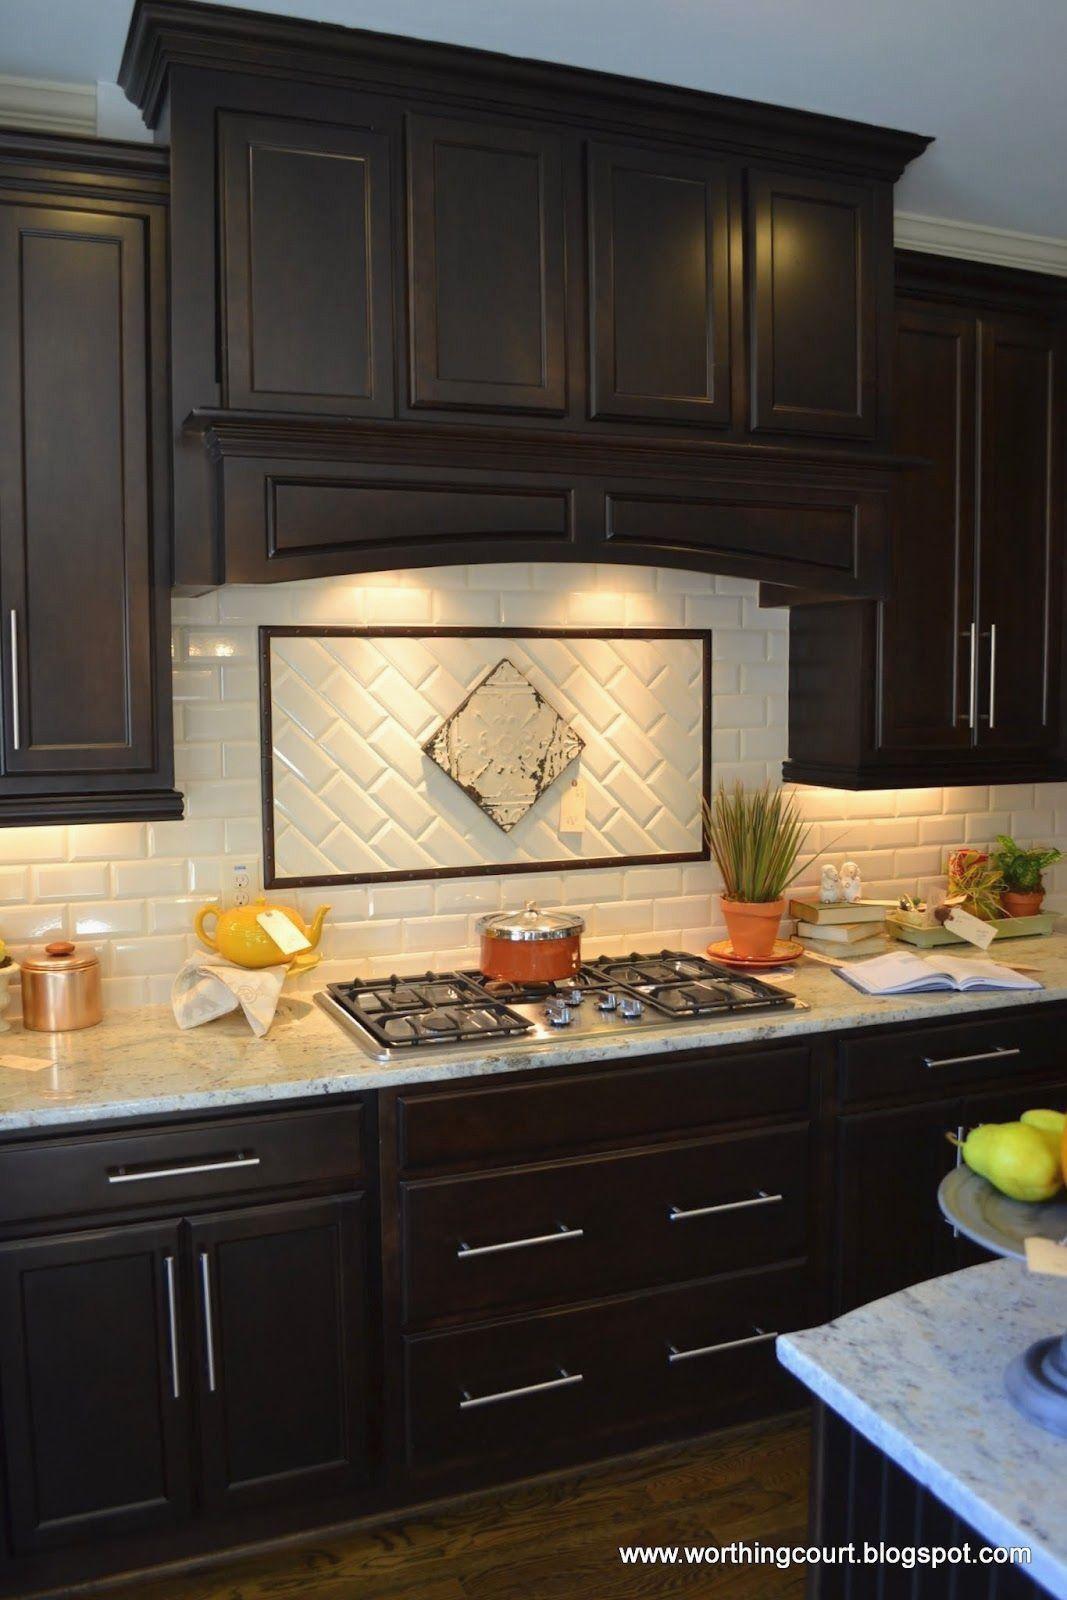 Stunning Contemporary Kitchen Backsplash Ideas Design ... on Modern Kitchen Backsplash With Maple Cabinets  id=63683